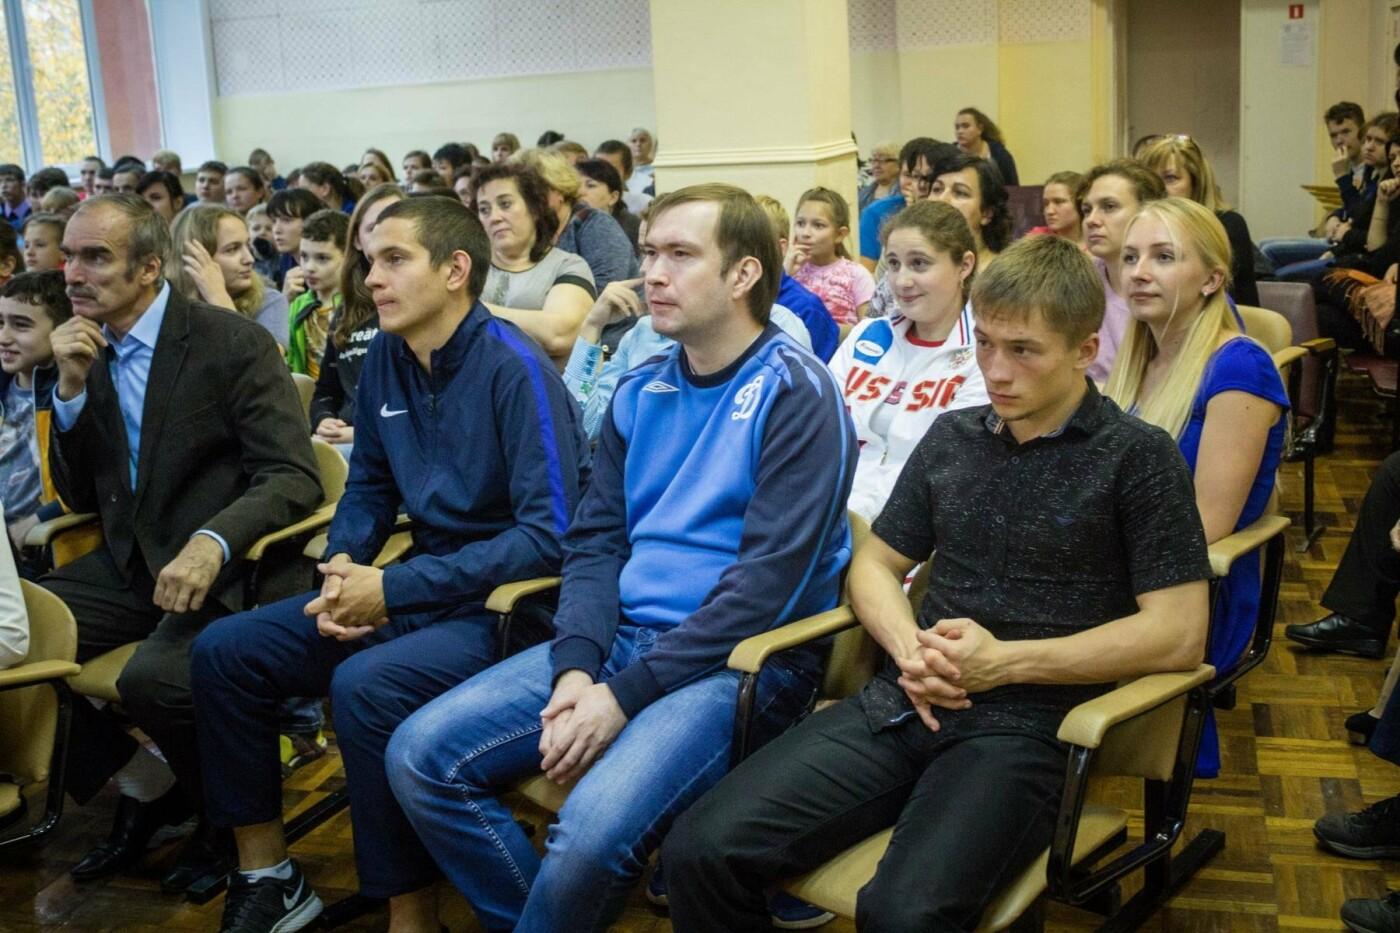 Федерация адаптивного спорта взяла курс на пропаганду здорового образа жизни среди молодёжи, фото-11